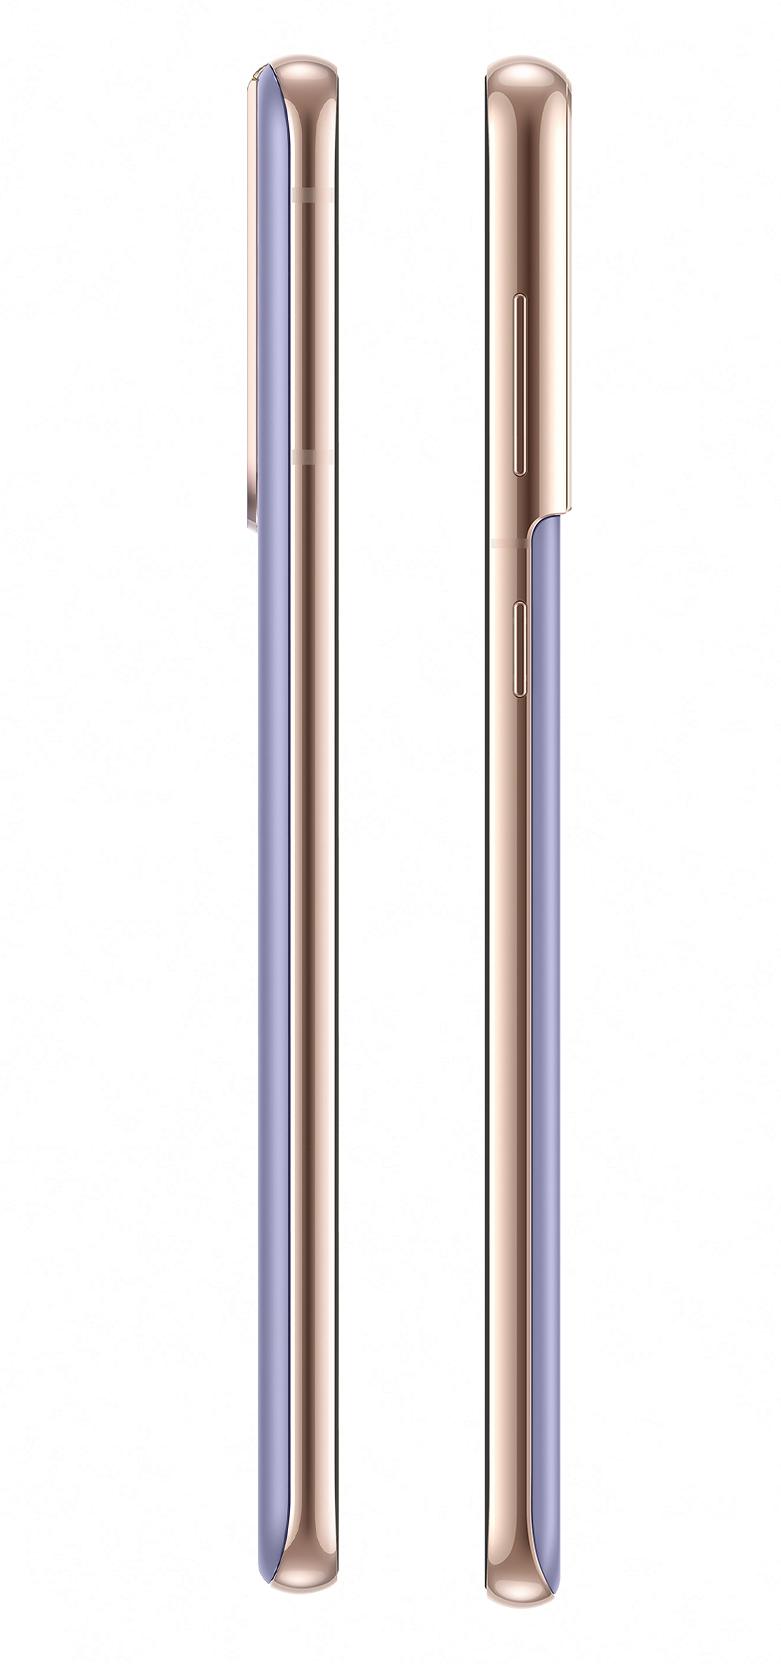 Samsung Galaxy S21 Plus 5G Phantom Violet 8GB RAM |256GB